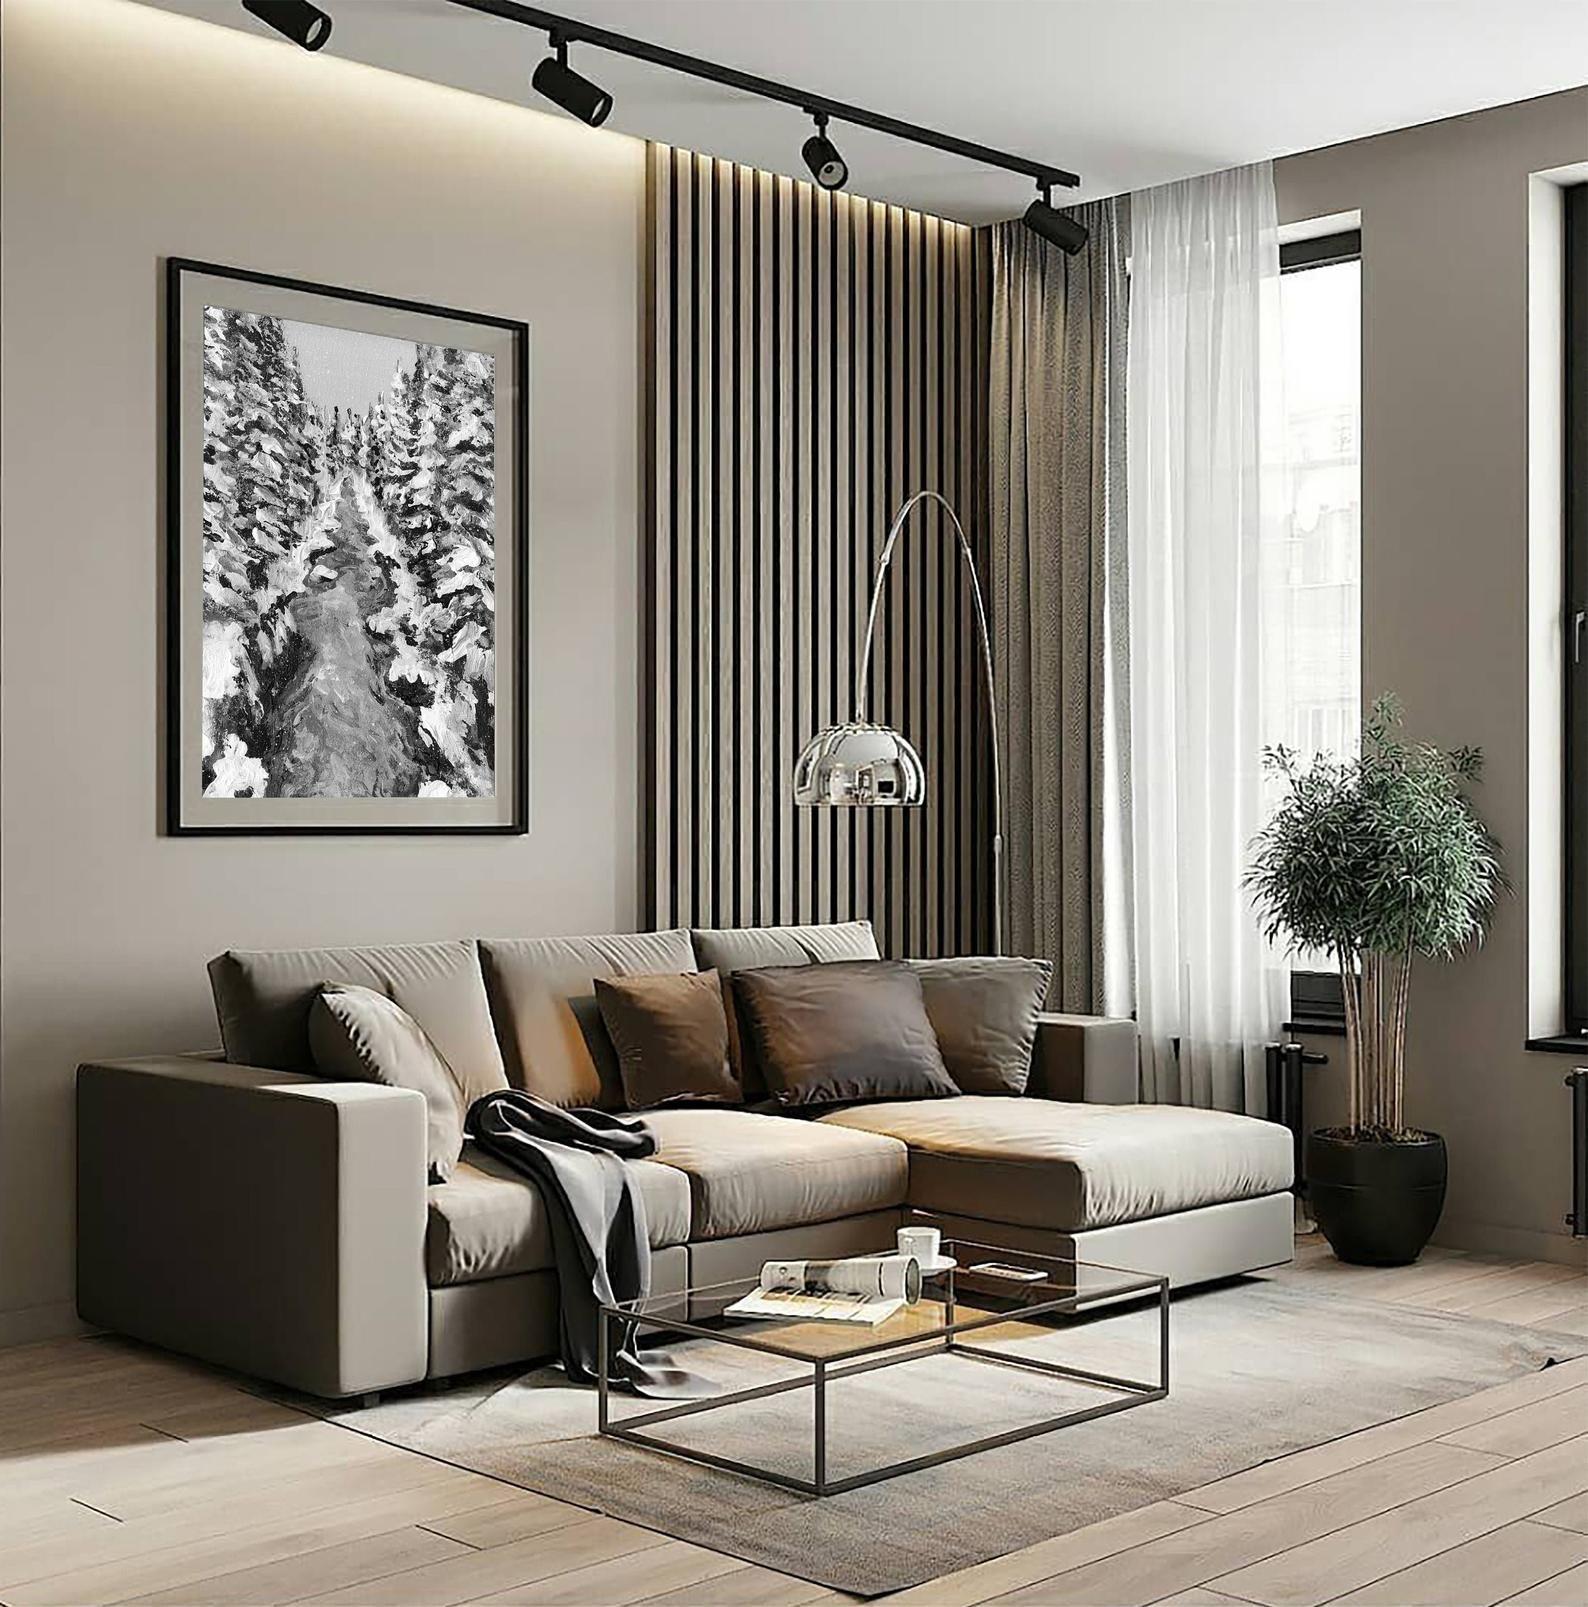 Digital Printing Of The Original Acrilic Painting Winter Etsy In 2021 Living Room Design Modern Minimalist Living Room Decor Minimalist Living Room